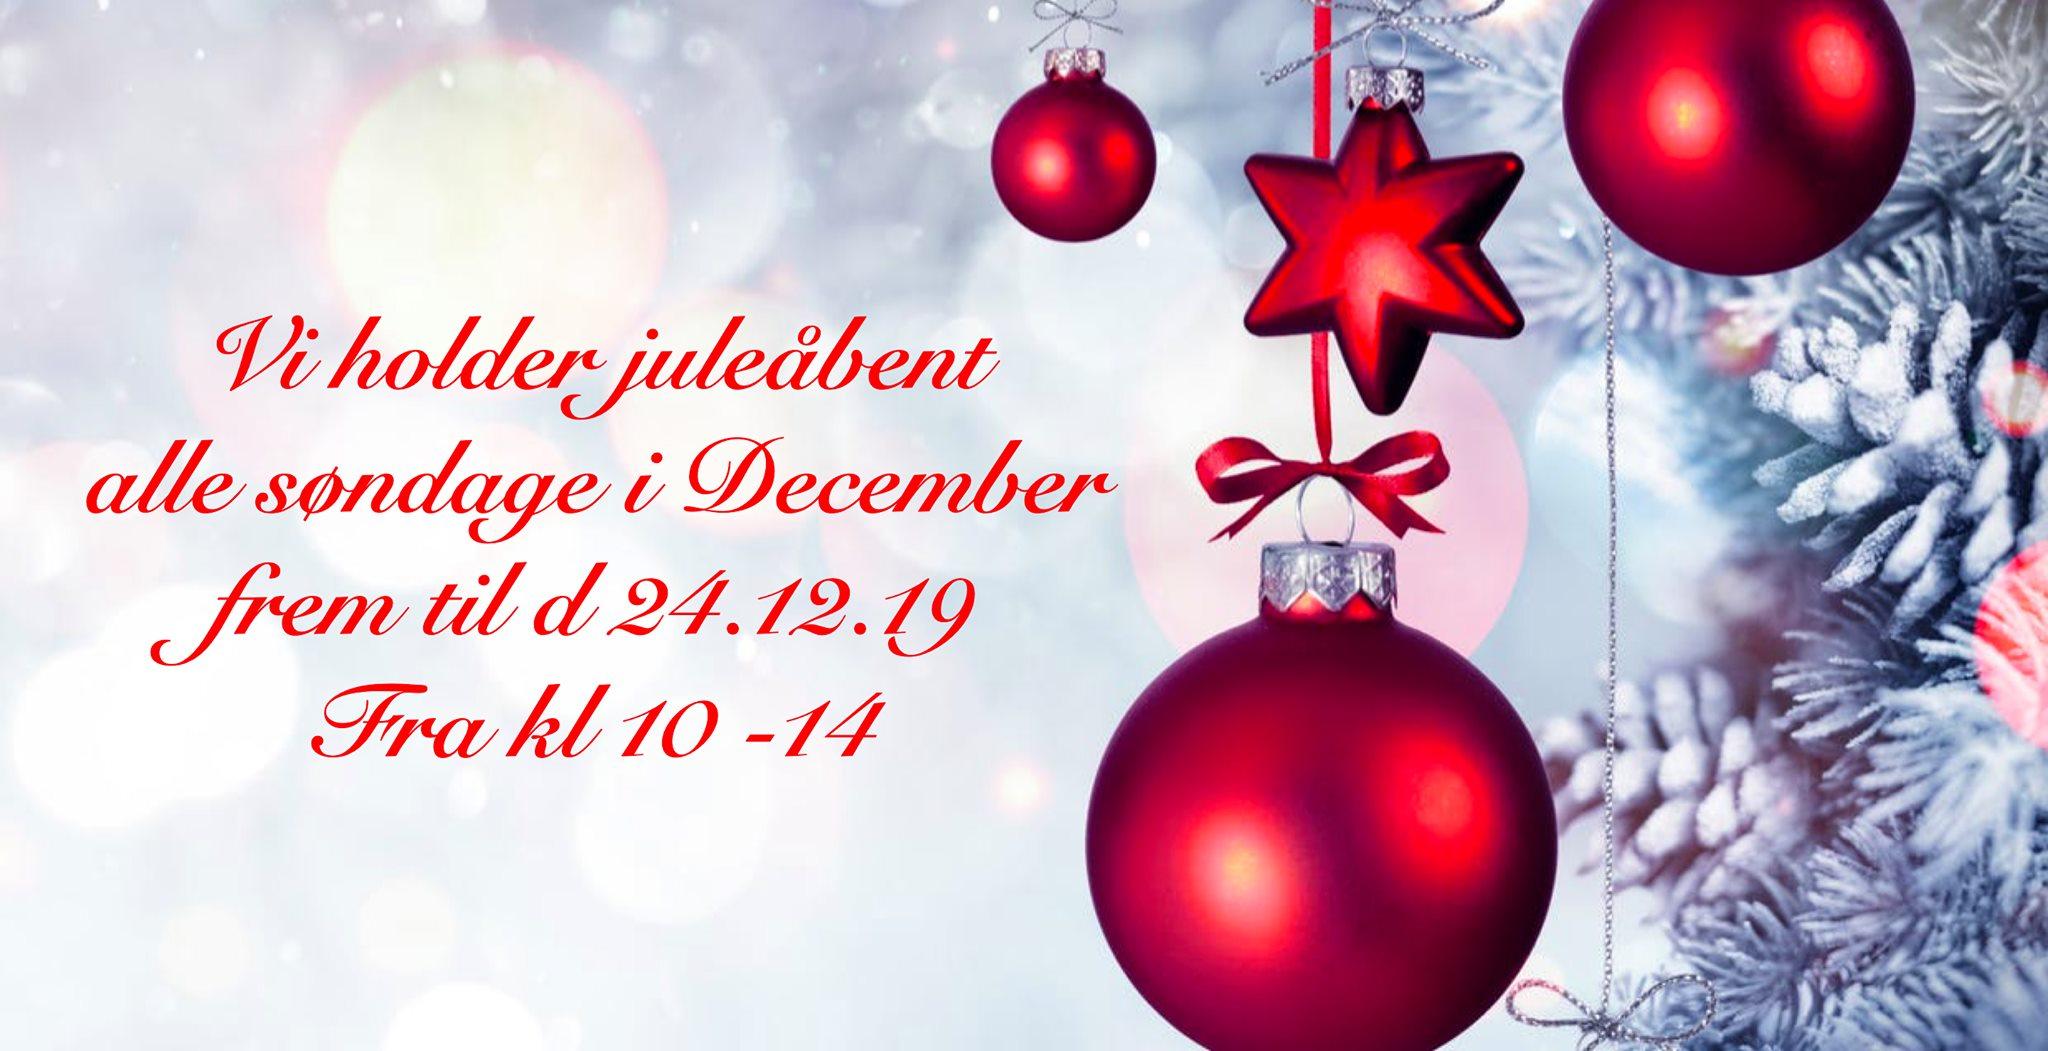 Juleåbent søndagsåbent 2019